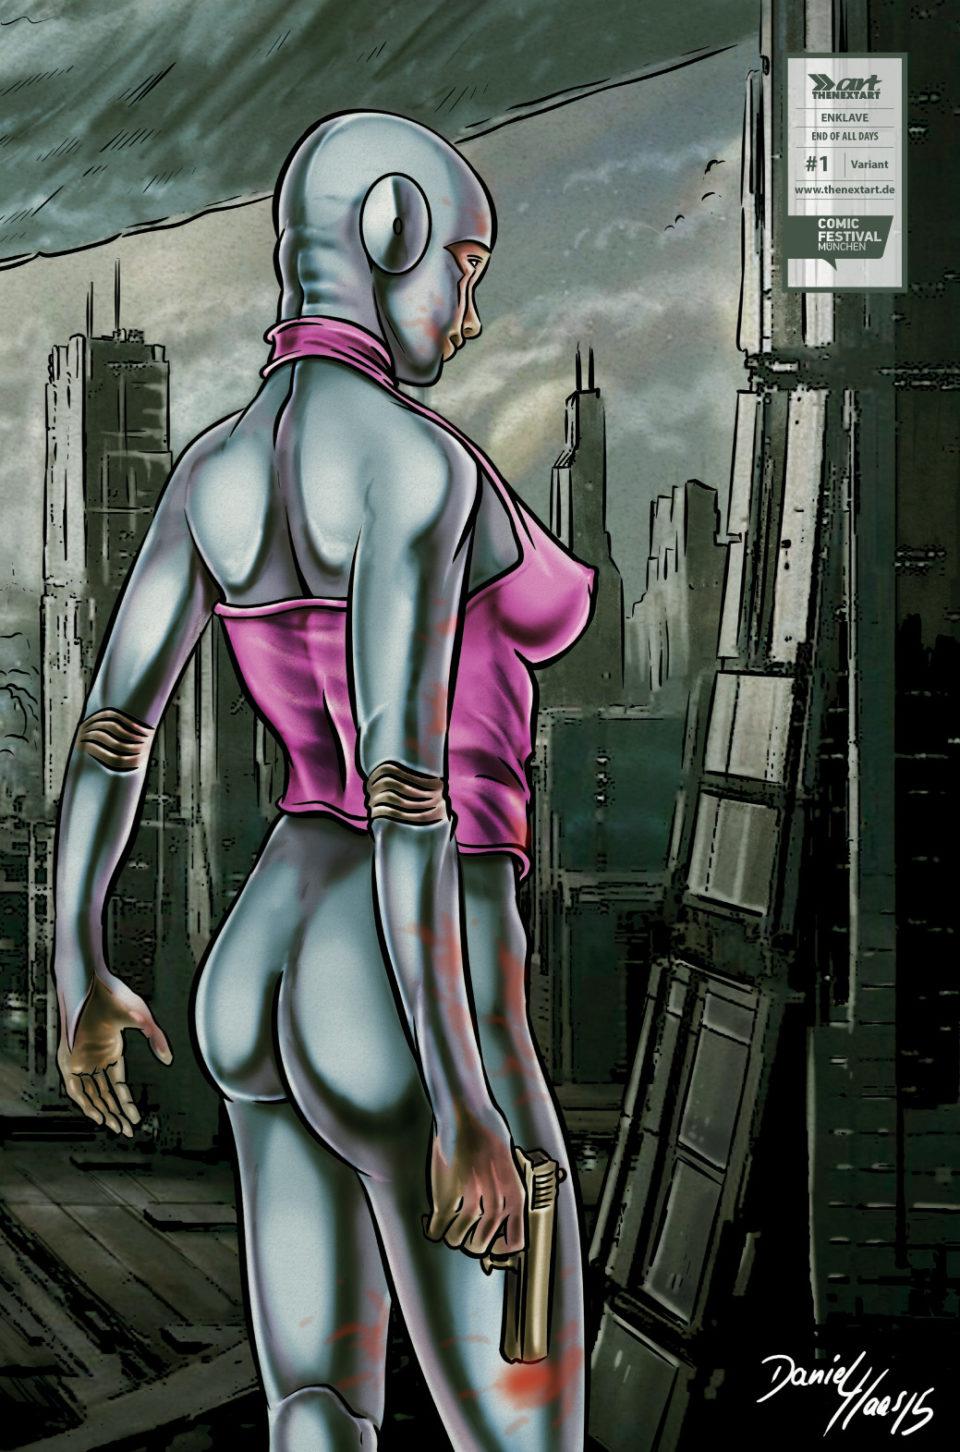 Sascha Dörp Comic Cabin Enklave - End of all Days 1 Variant Cover Daniel Haas